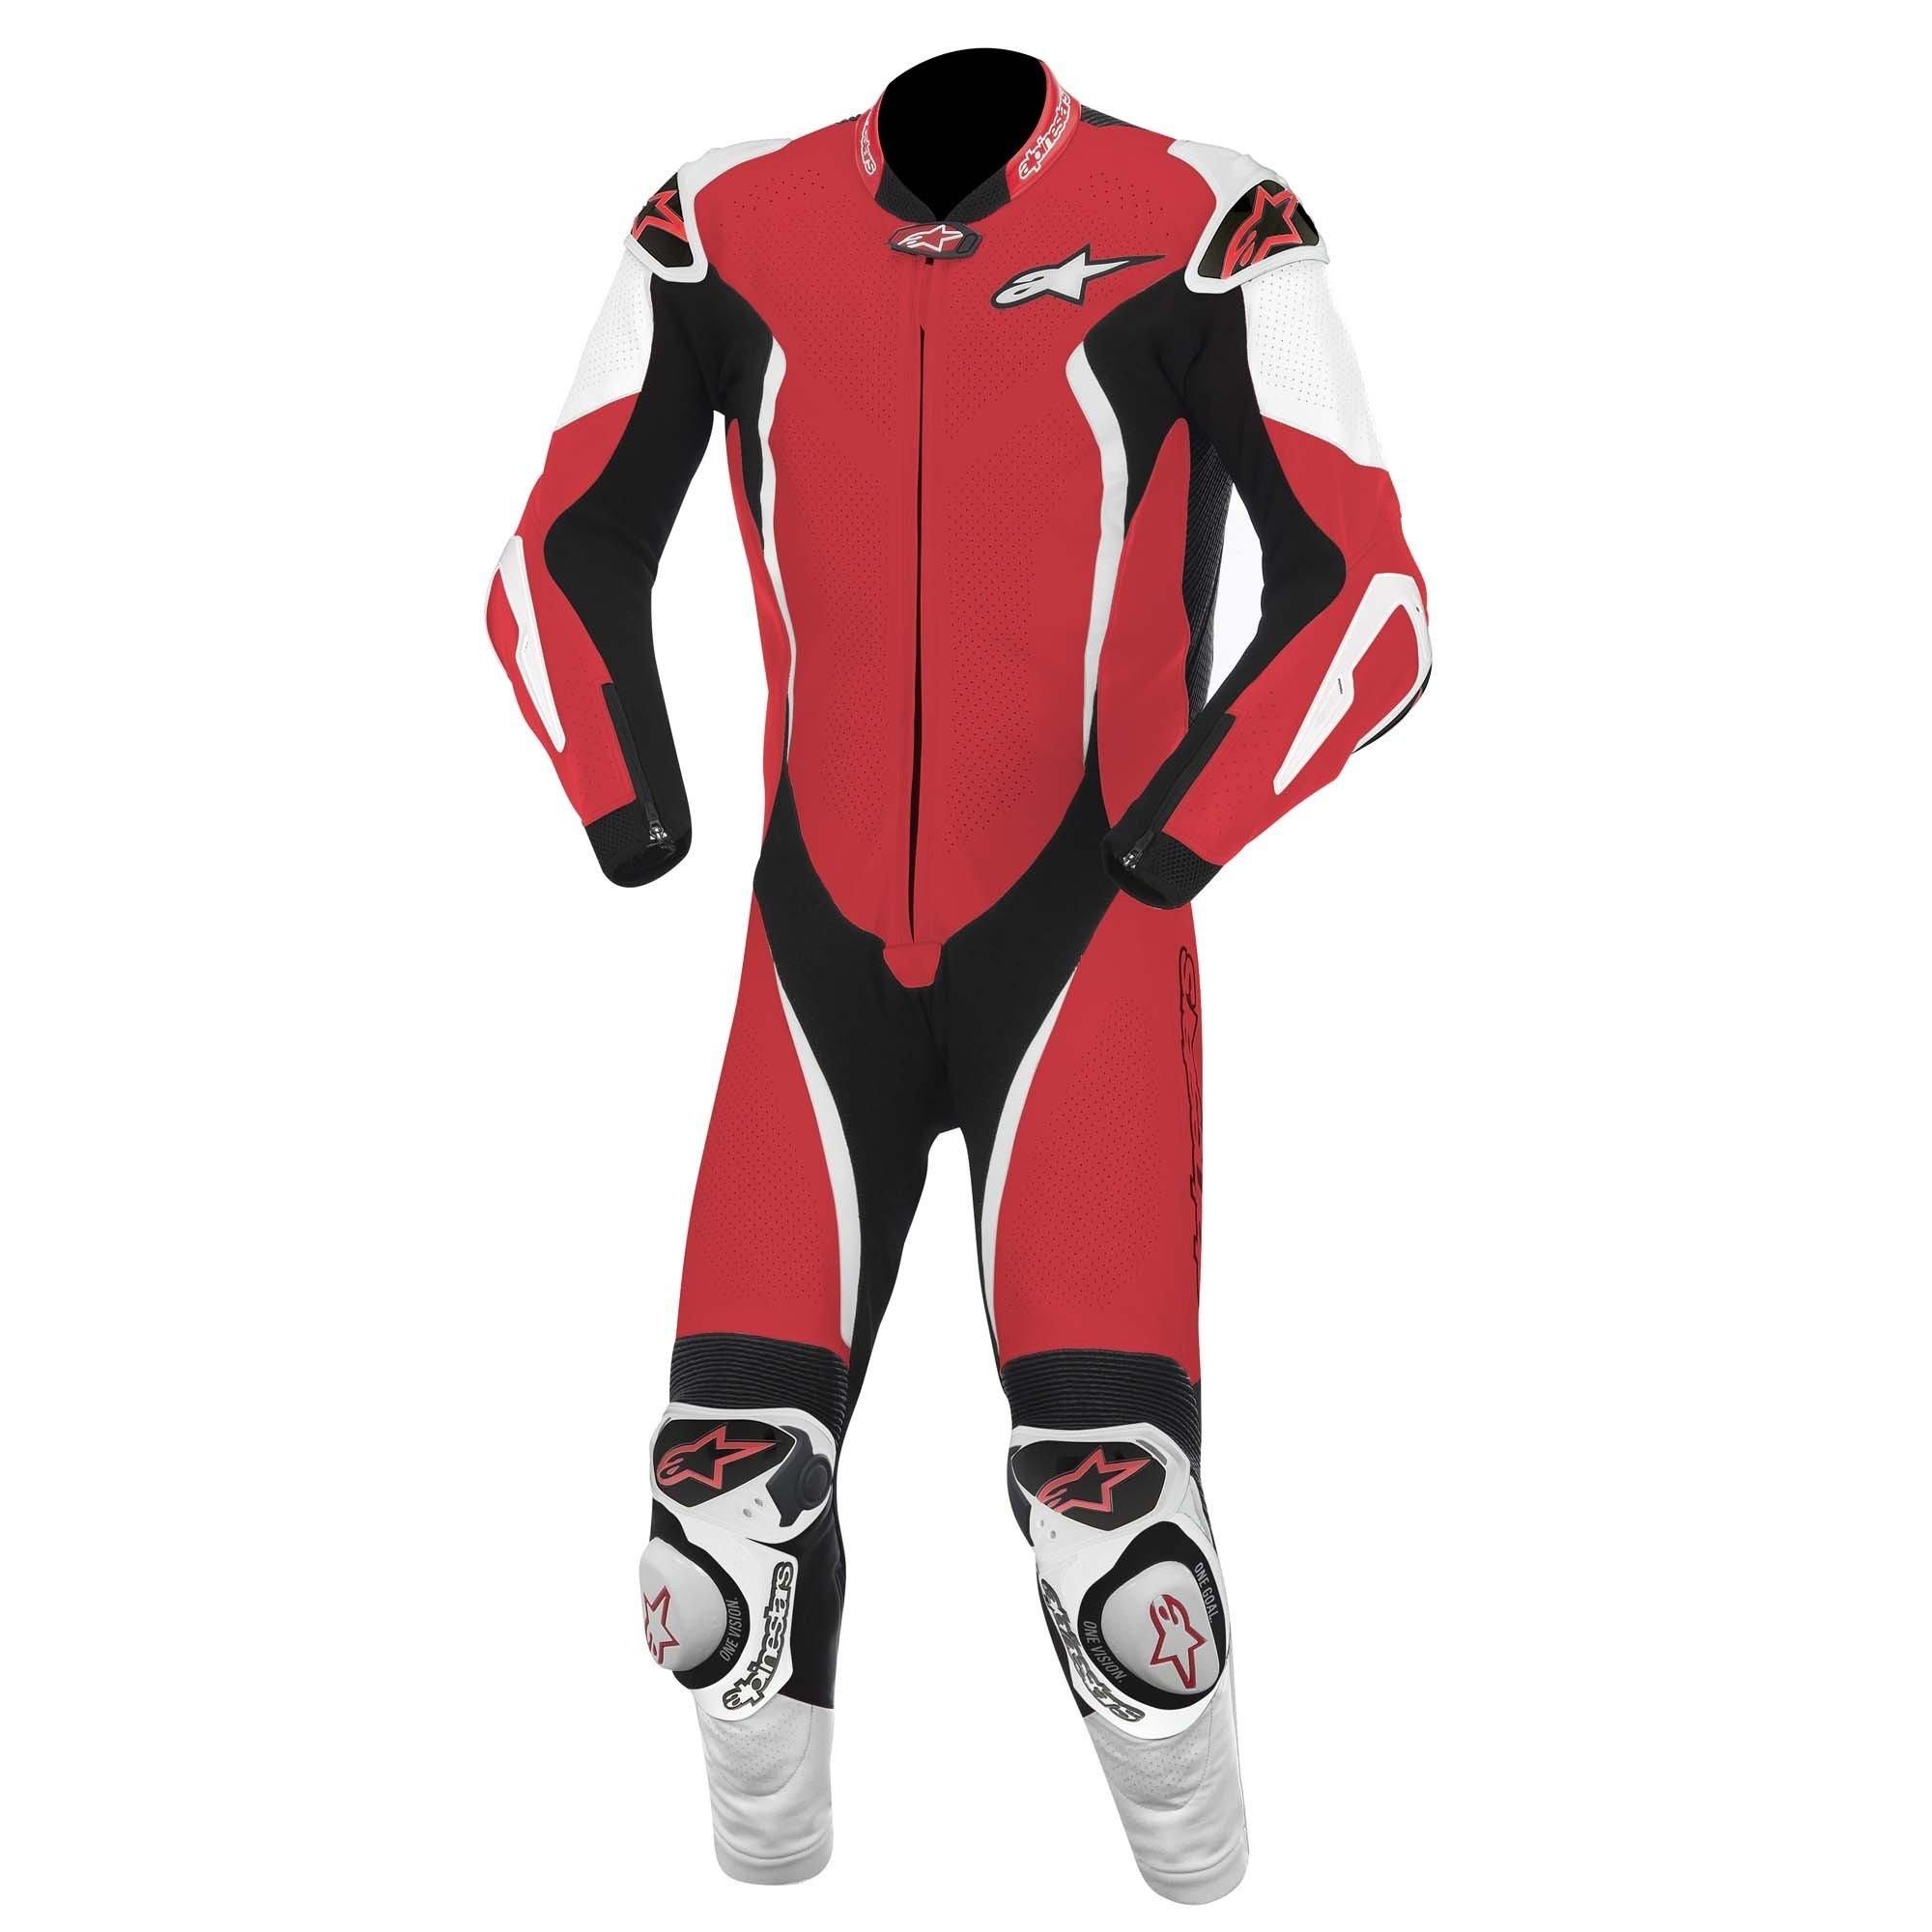 Alpinestars GP Tech Red/Black (2015) 54